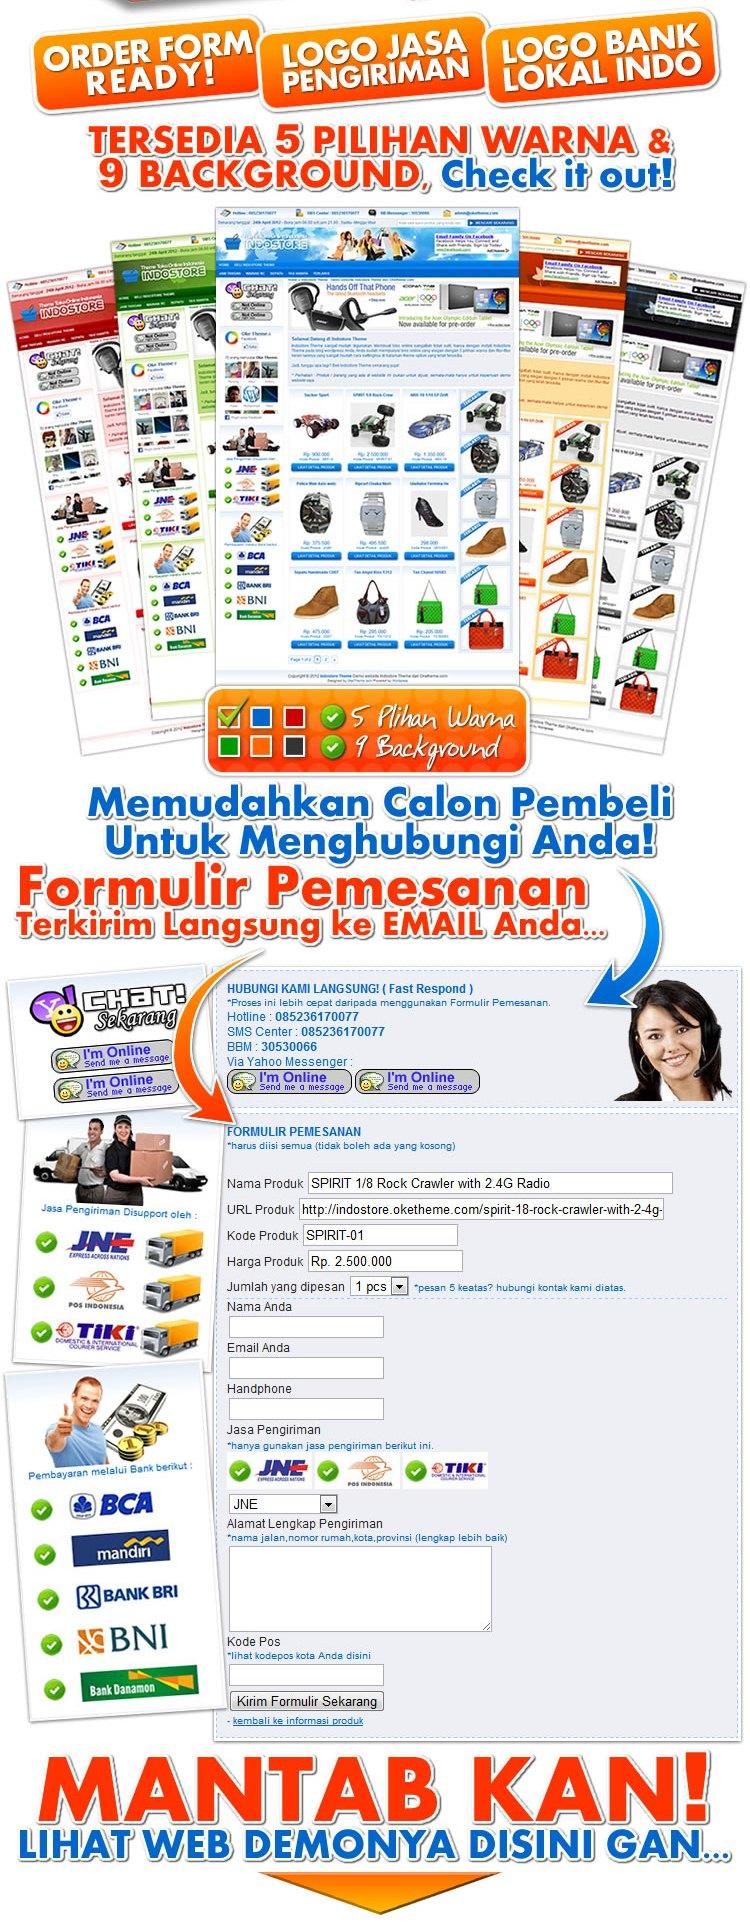 Jasa toko online wordpress murah